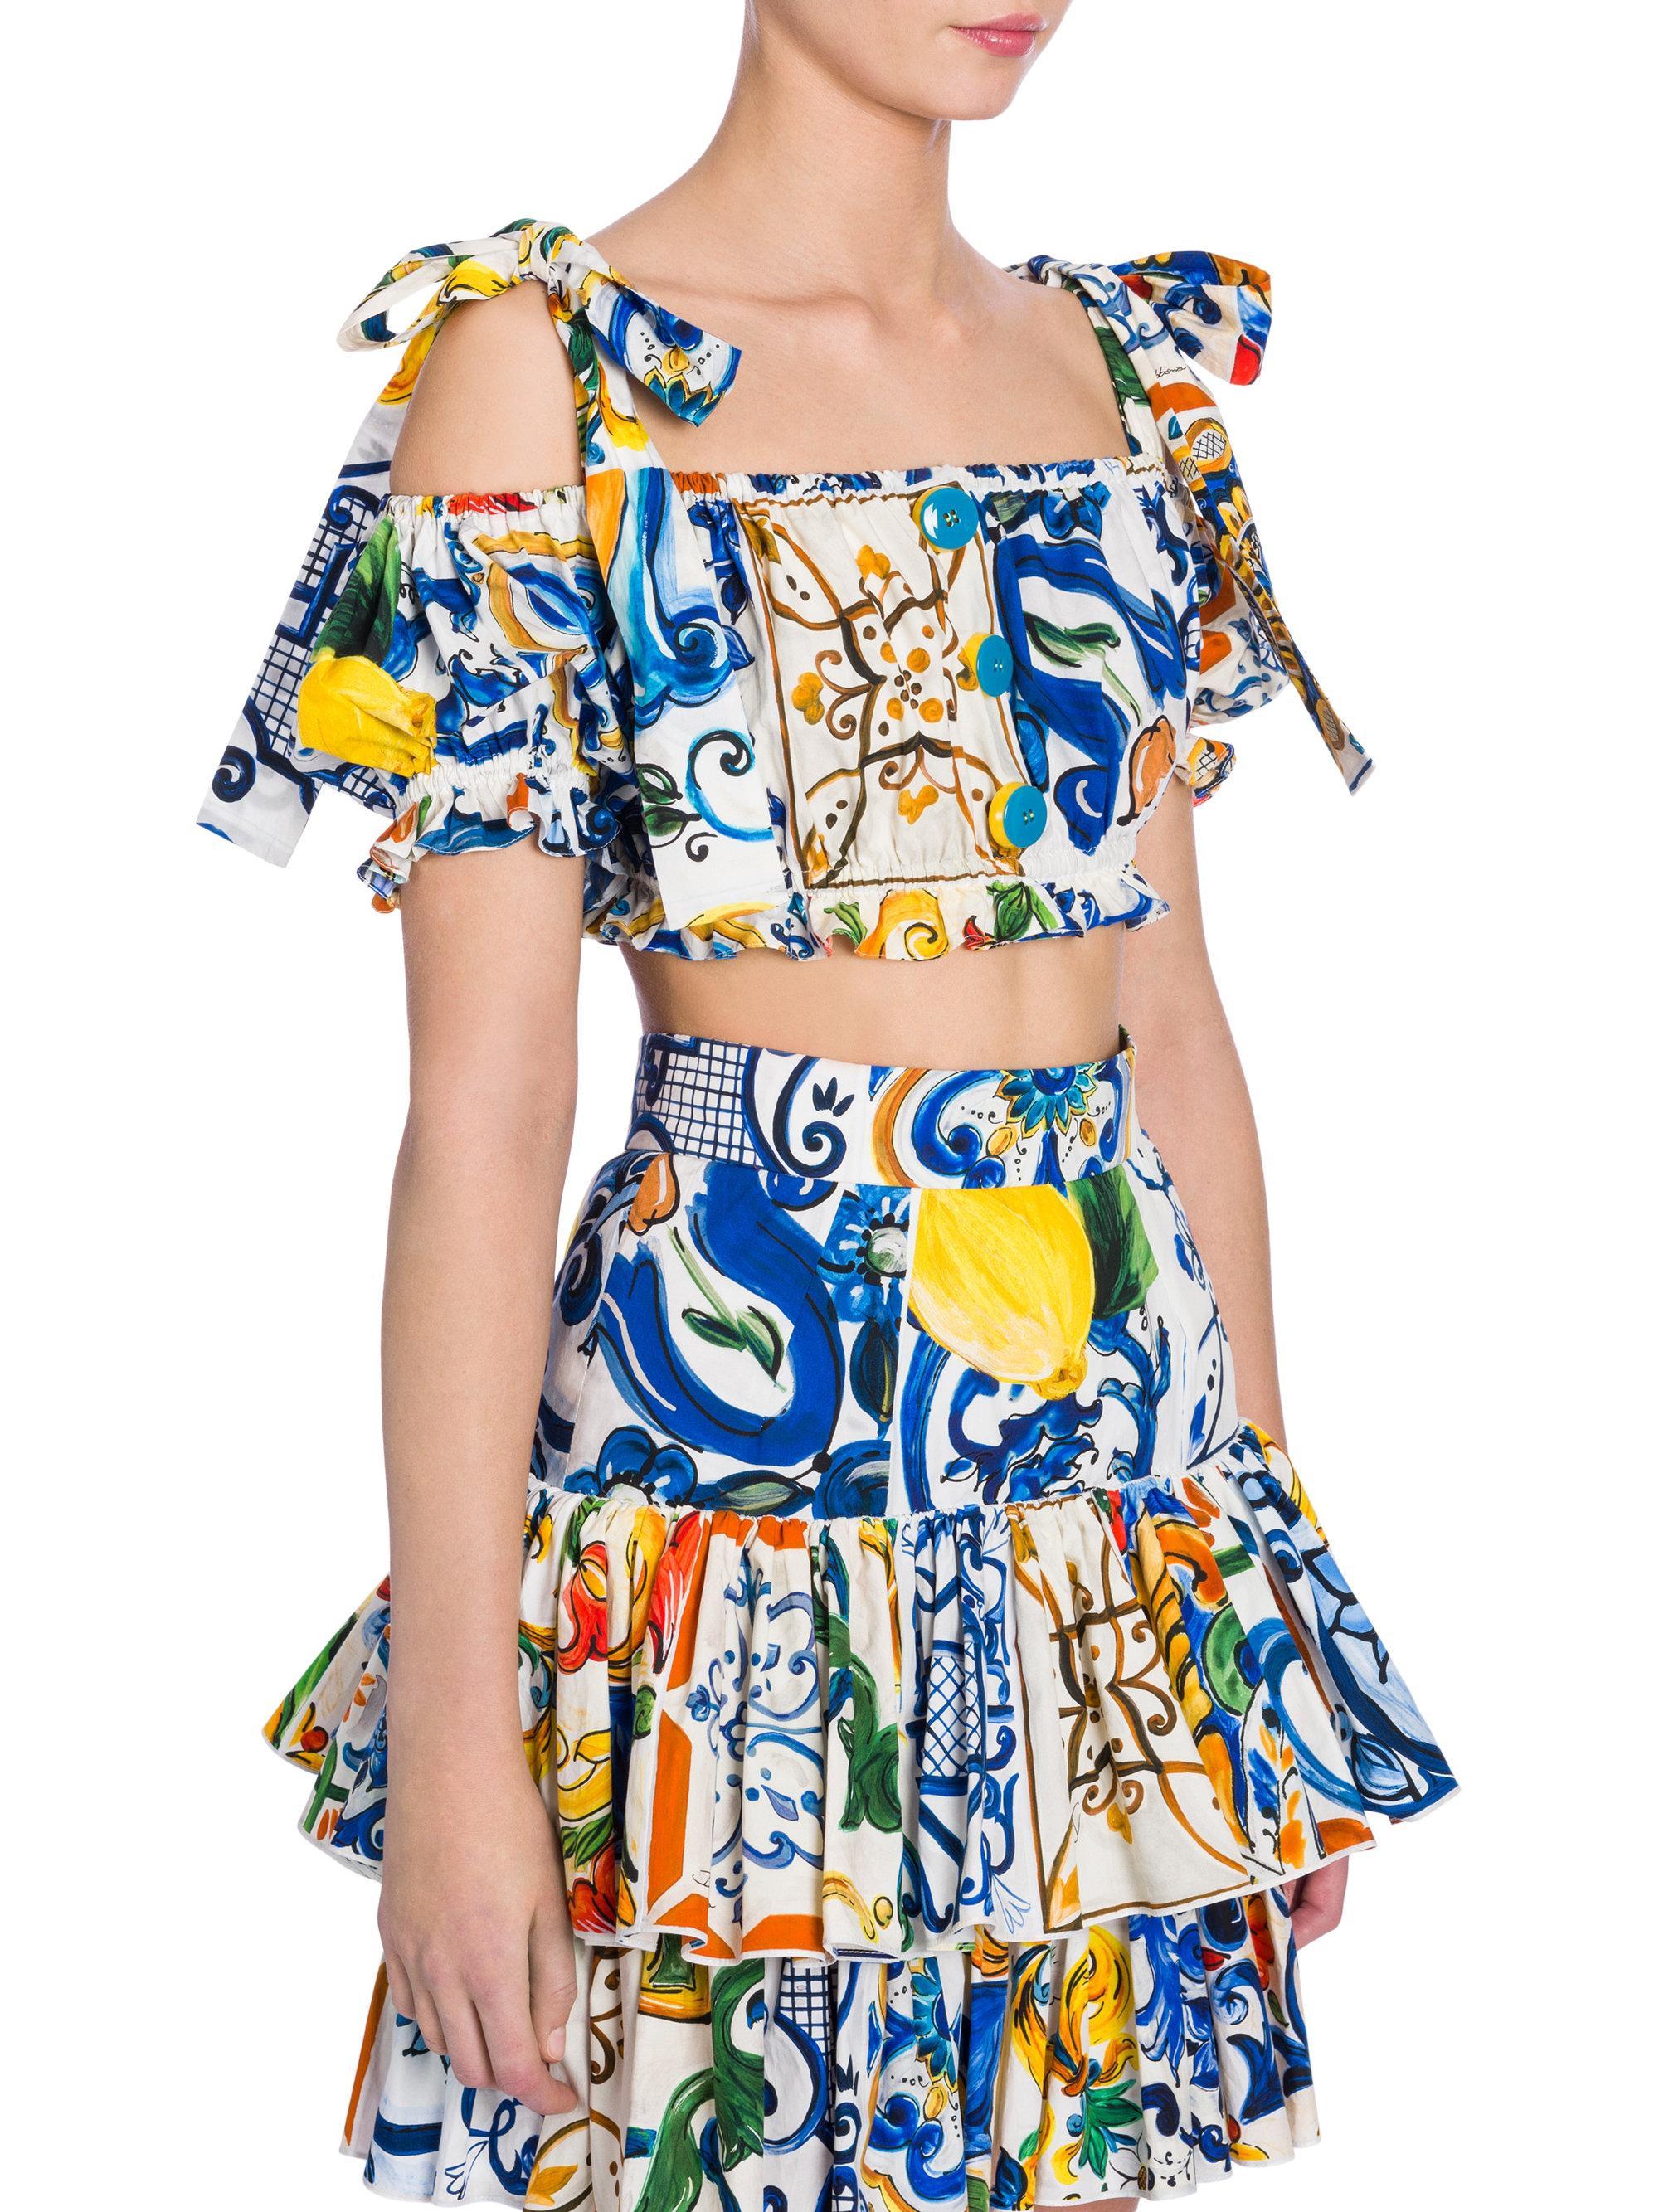 5a0bd6a1d26f16 Dolce   Gabbana Majolica-print Cotton Top in Blue - Lyst